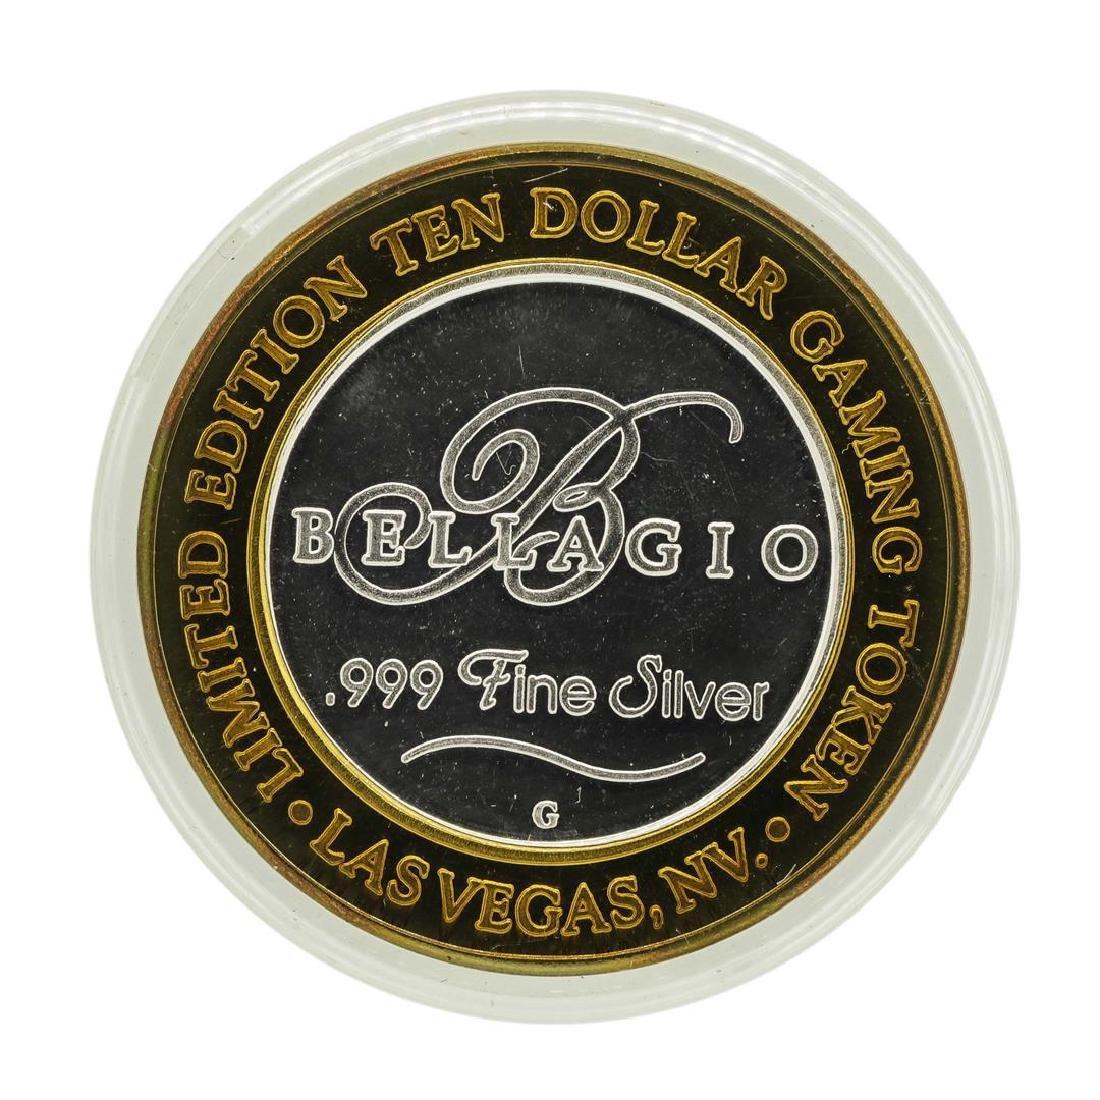 .999 Silver Bellagio Las Vegas, Nevada $10 Casino - 2